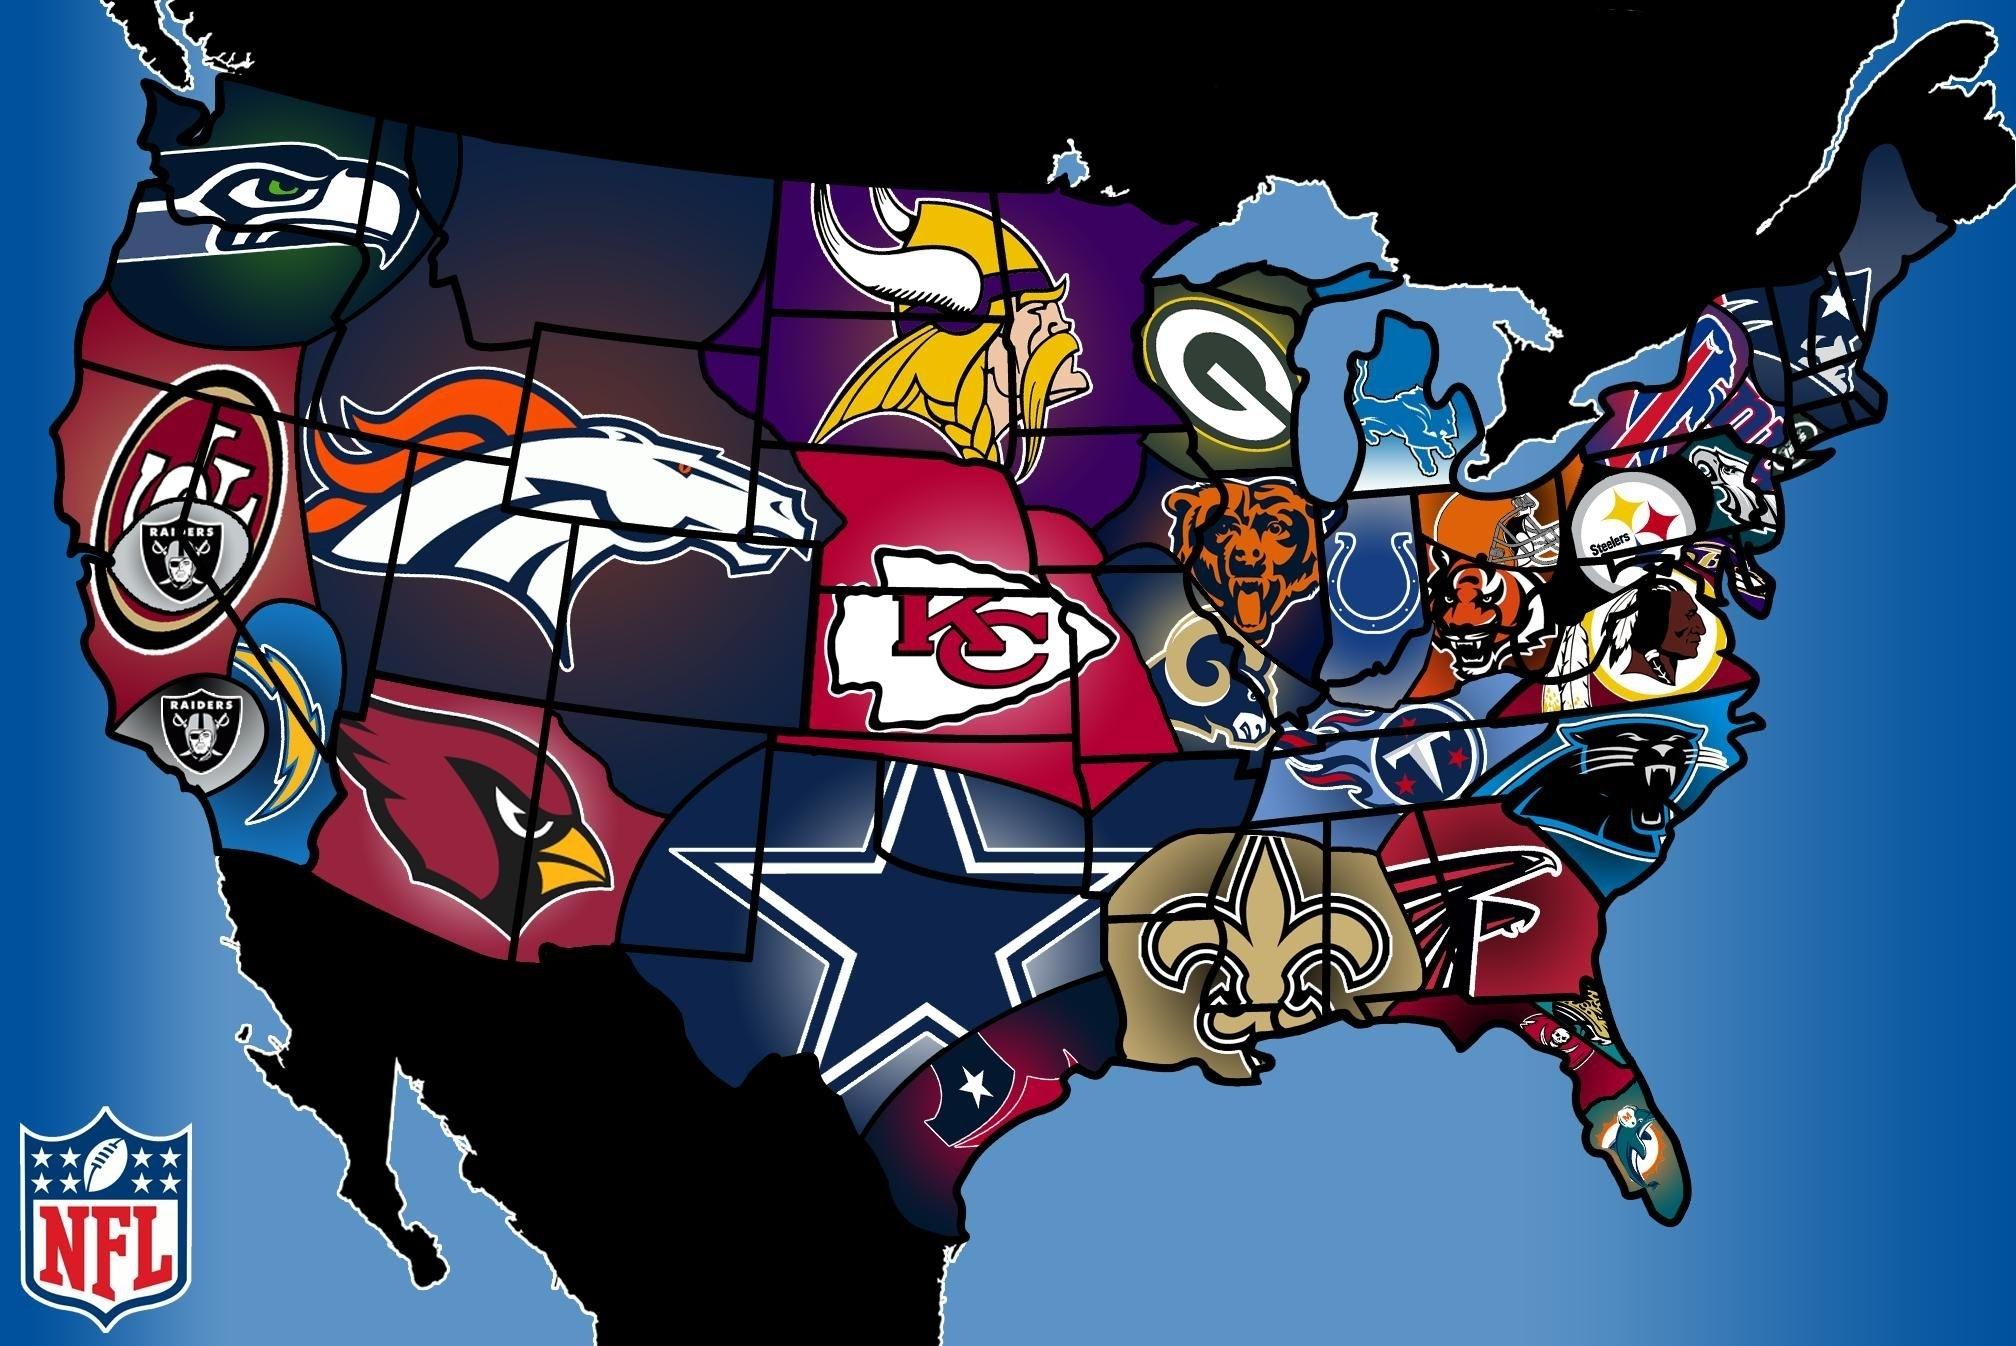 nfl football logos wallpapers - http://69hdwallpapers/nfl